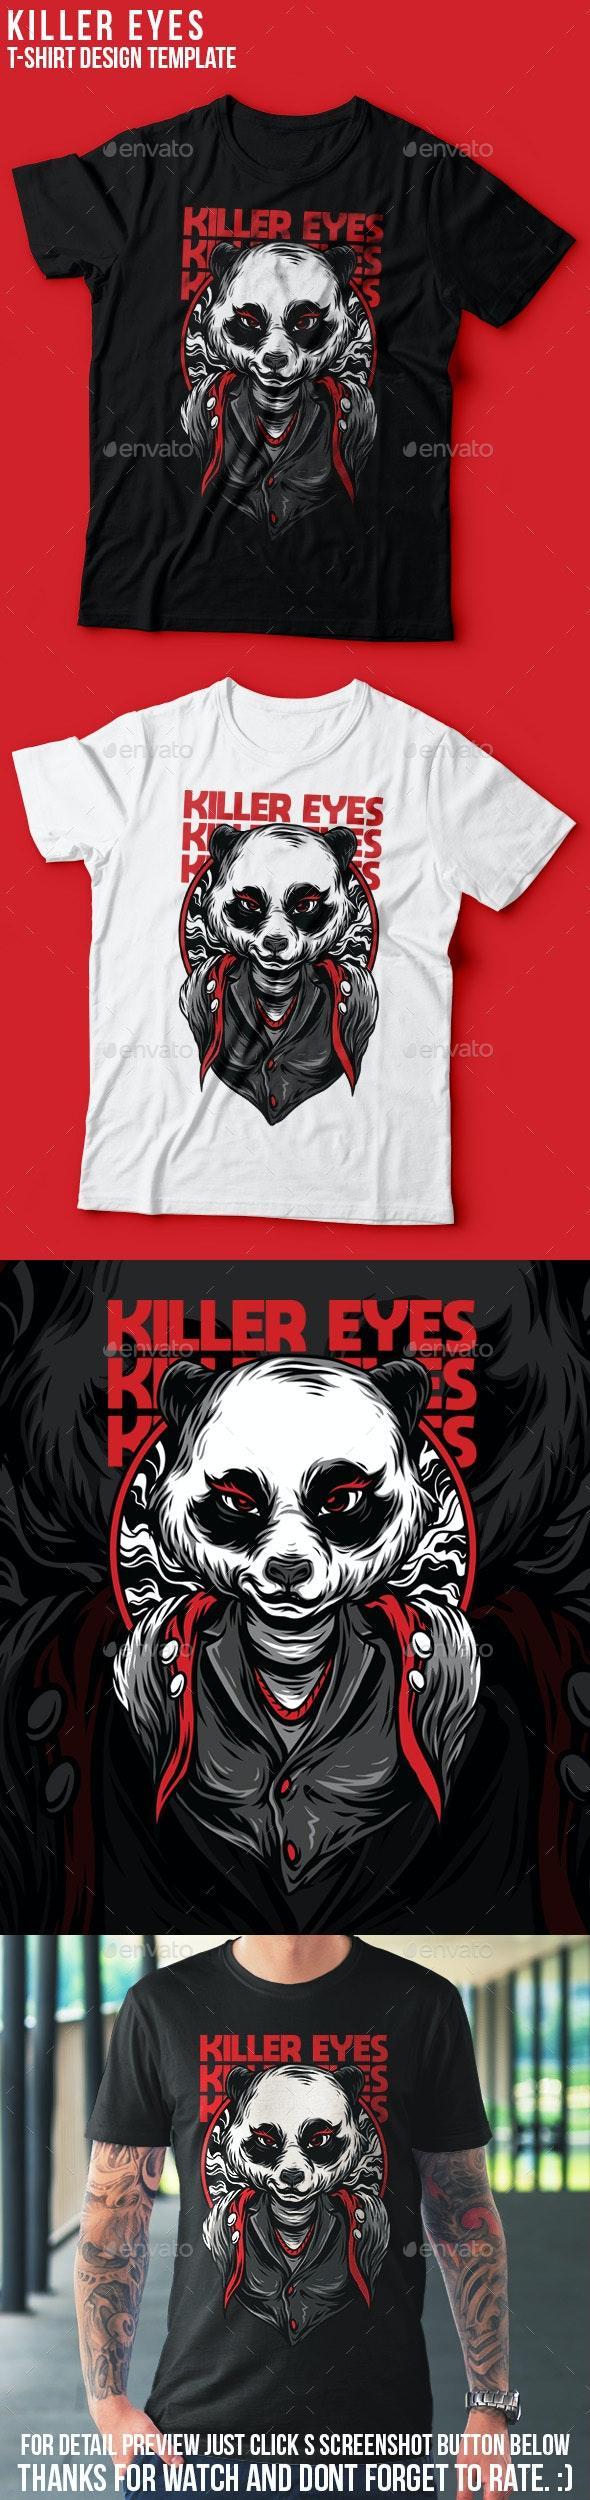 Killer Eyes T-Shirt Design - Clean Designs